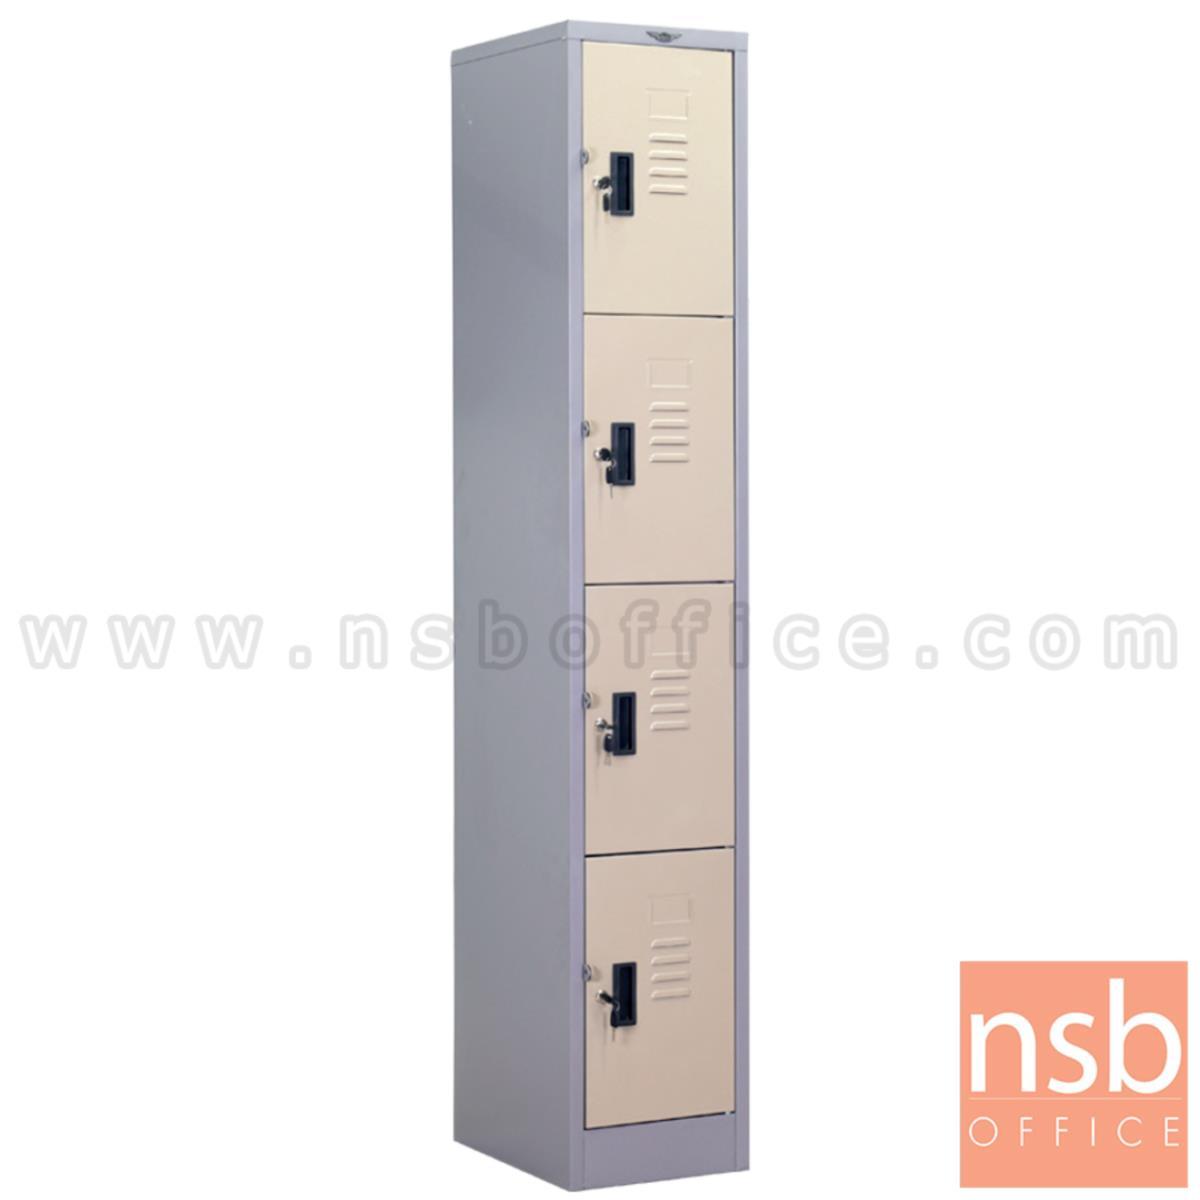 E03A050:ตู้ล็อคเกอร์ 4 ประตู รุ่น Fareham (แฟร์อัม)  มีกุญแจล็อค